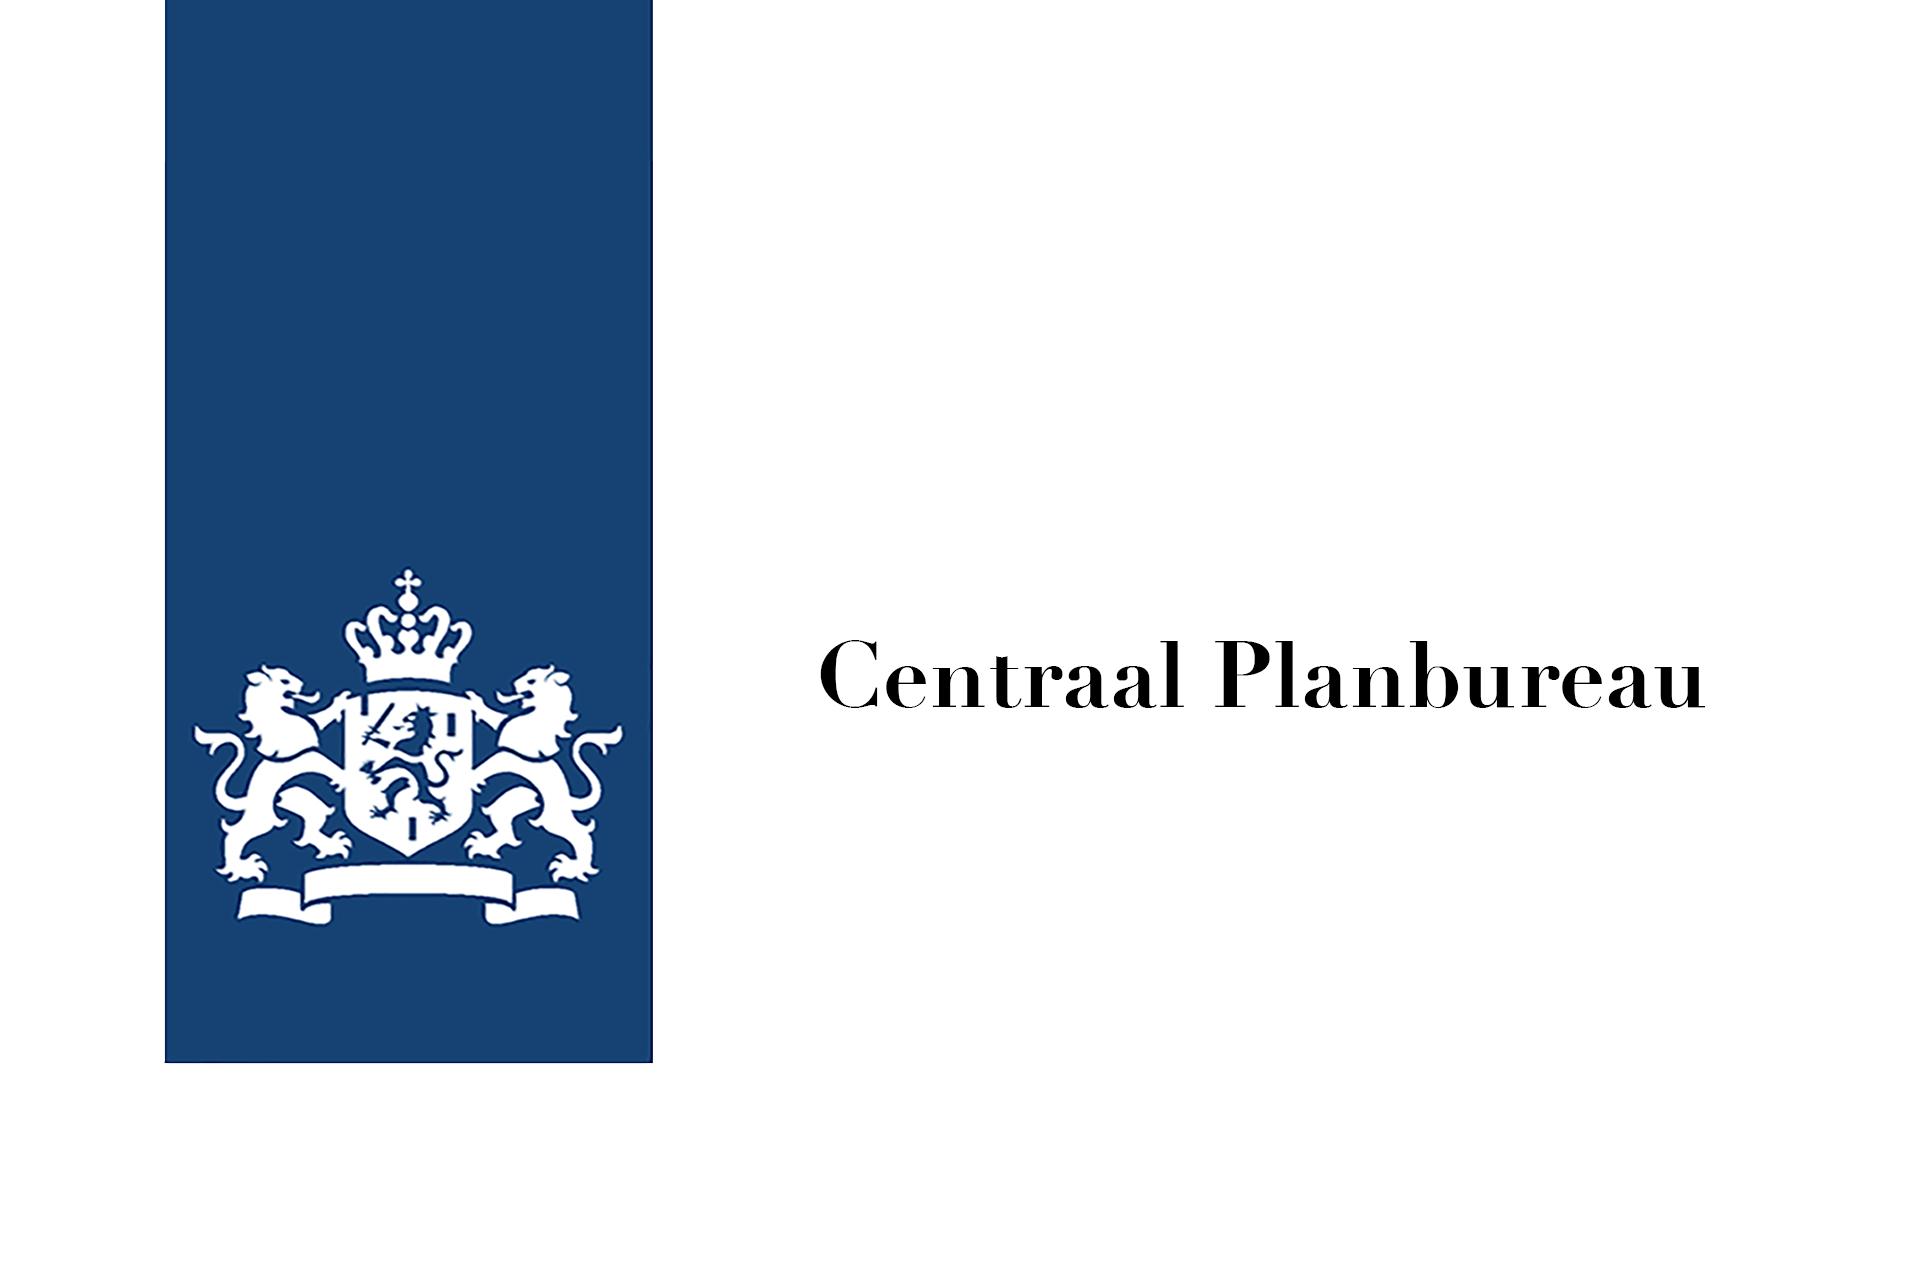 Centraal-Planbureau